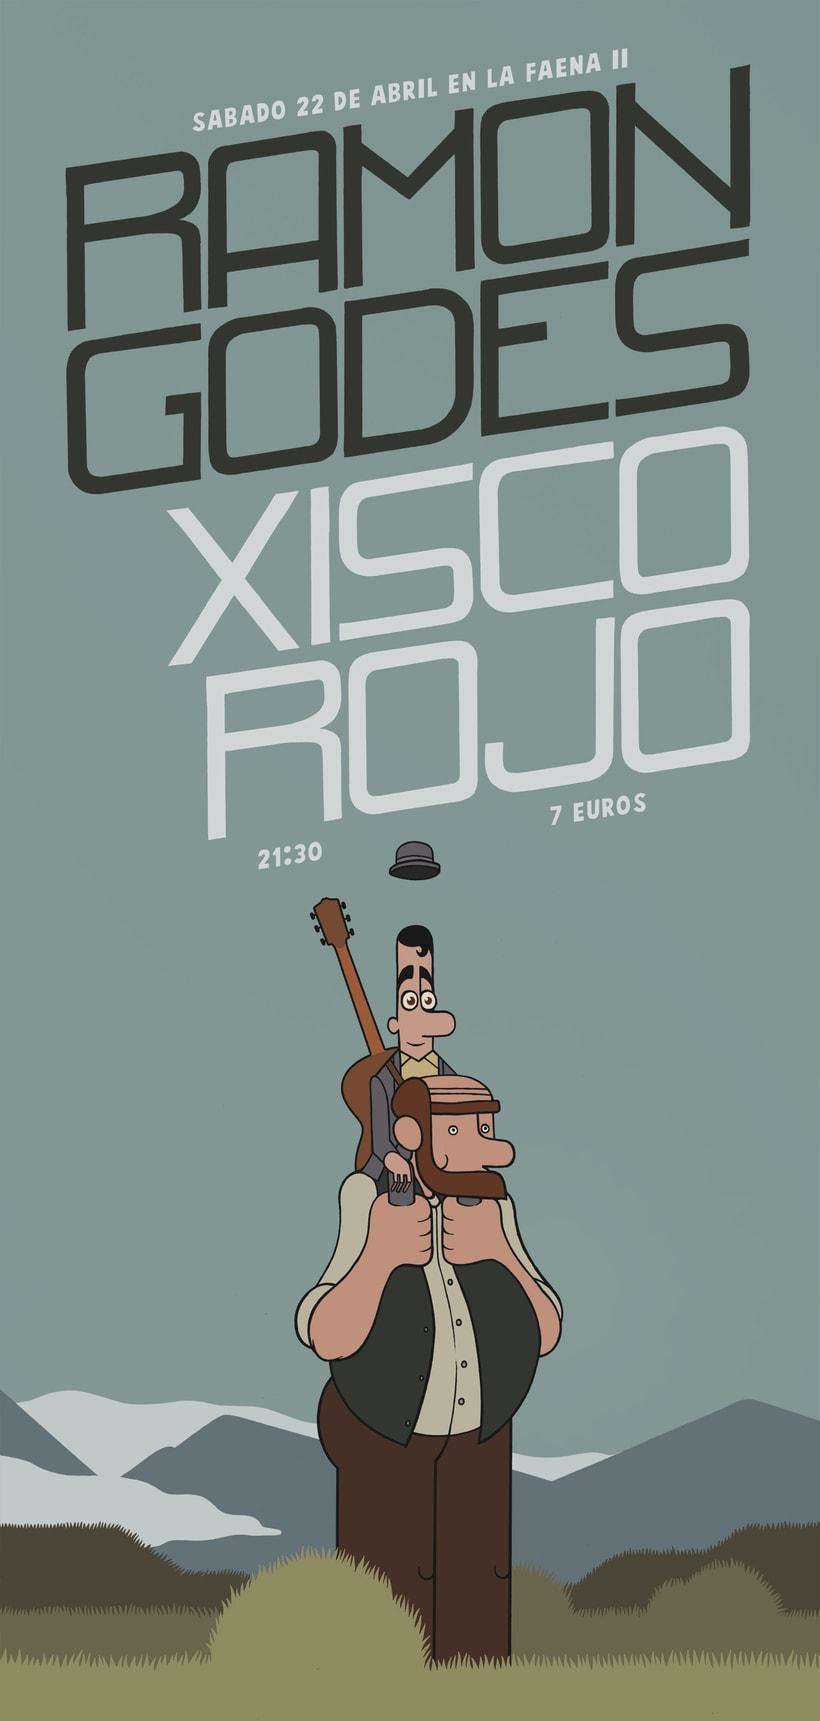 Ramon Godes + Xisco Rojo -1